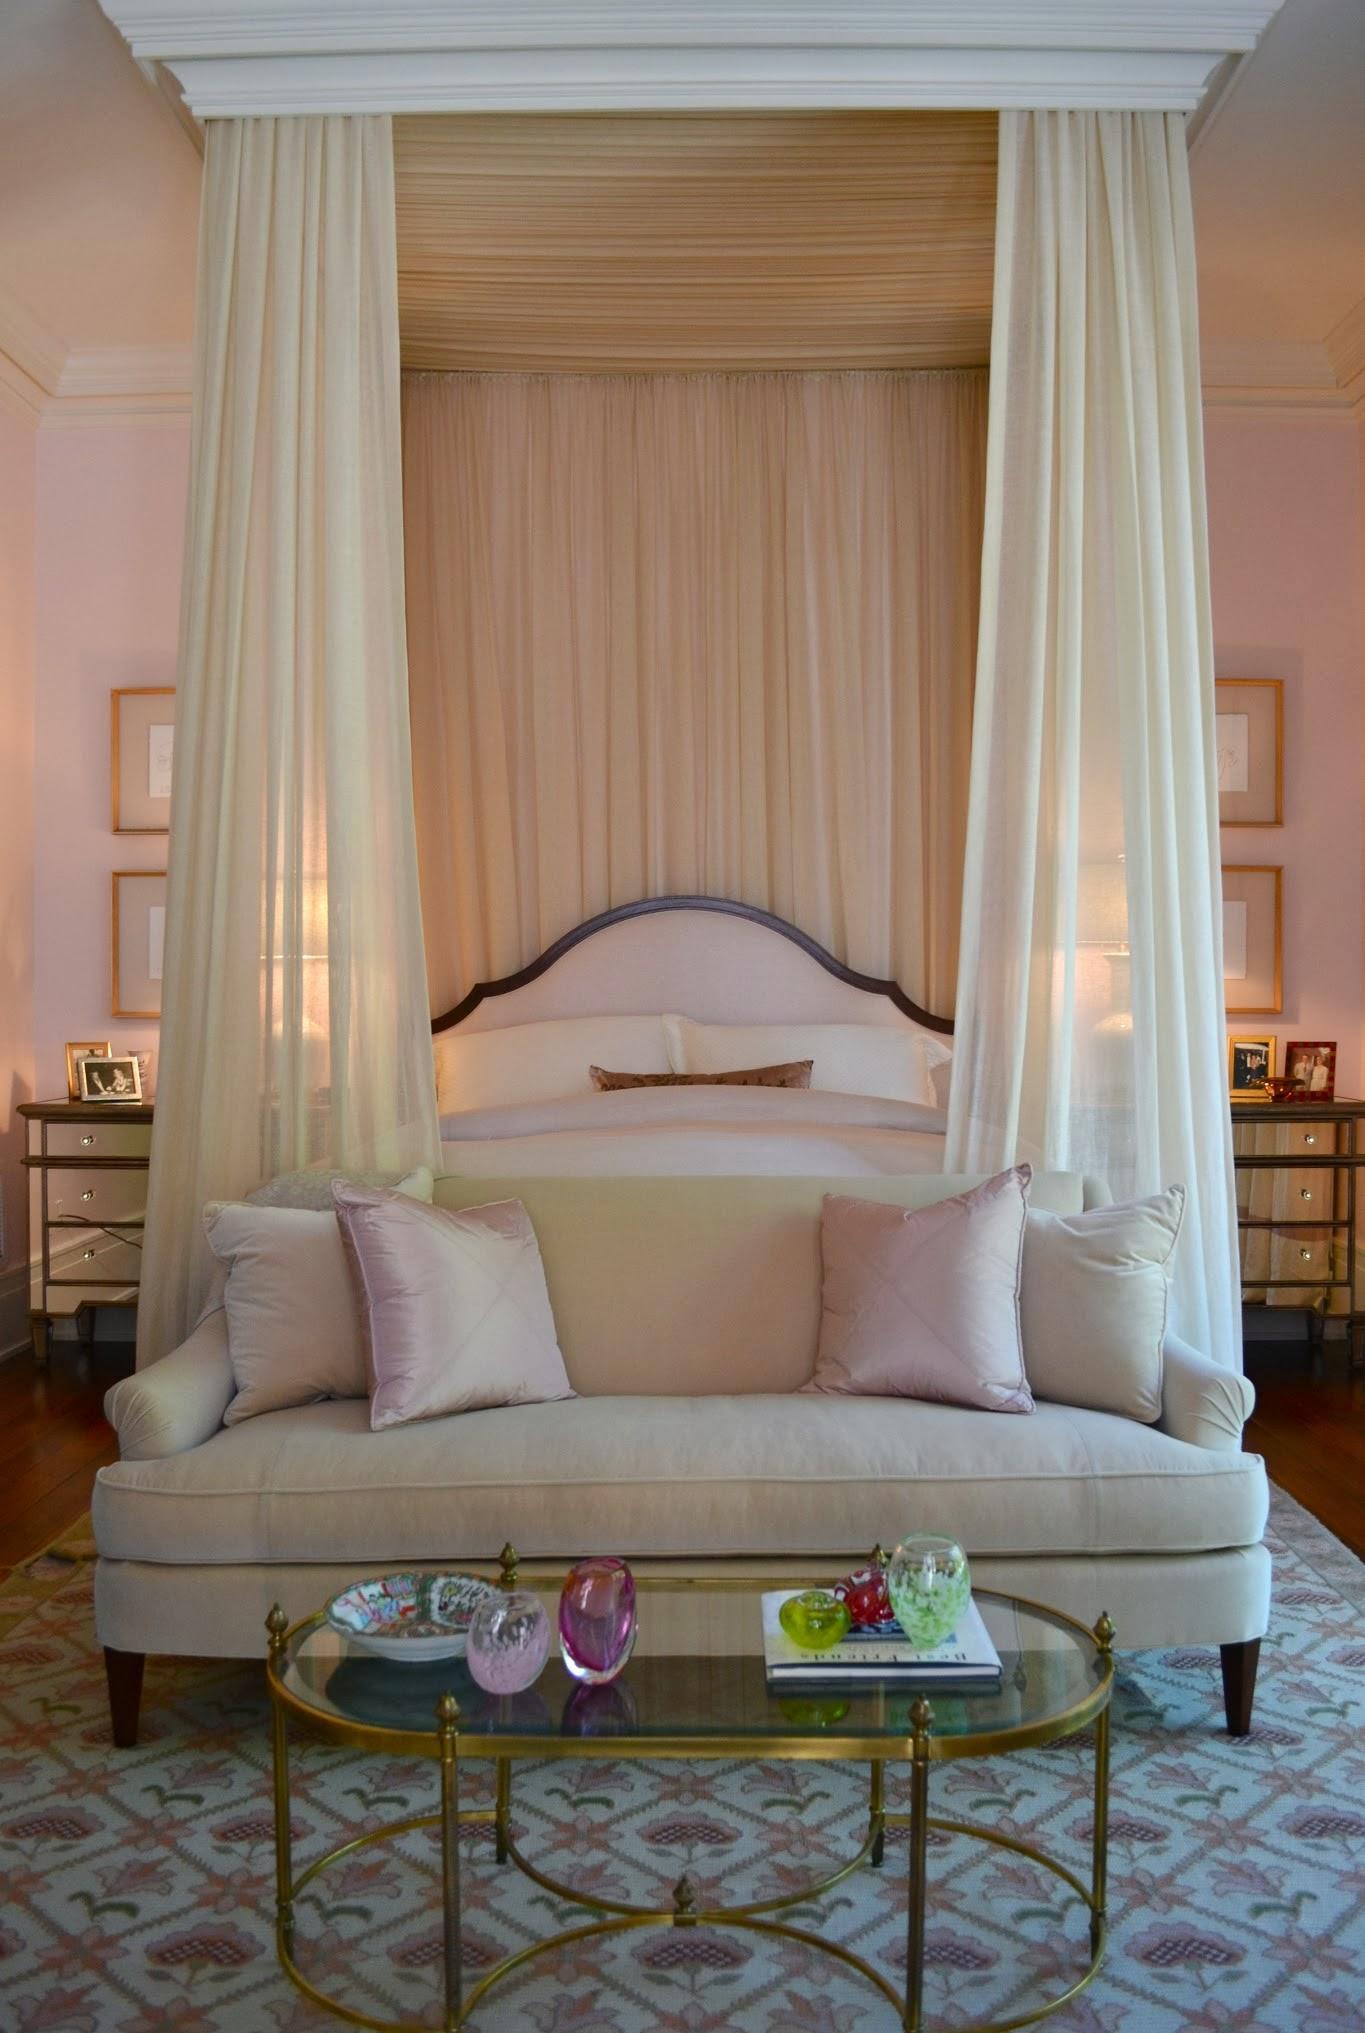 Кремый балдахин над кроватью